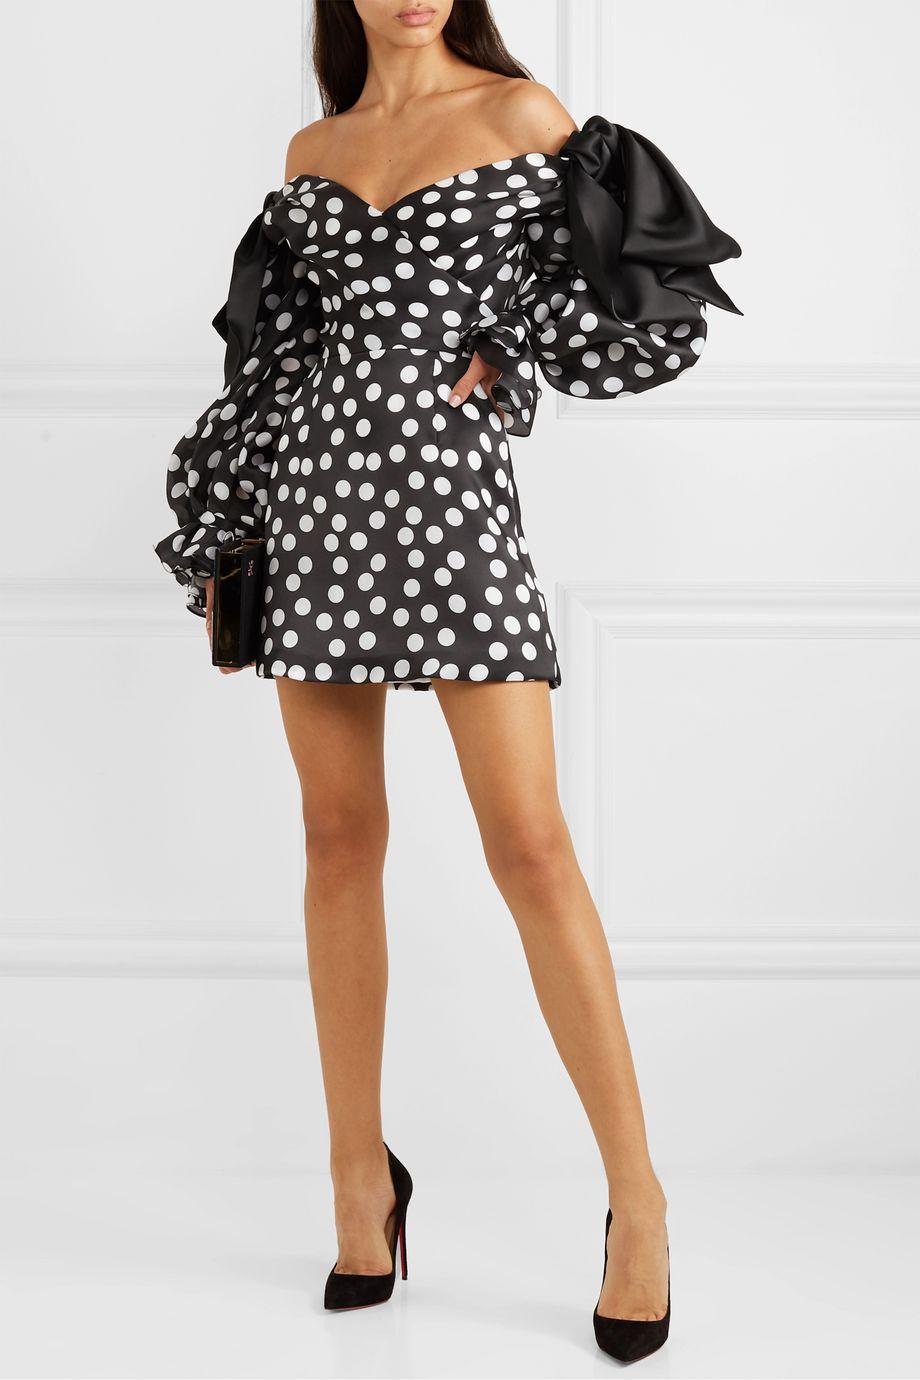 Carolina Herrera Off-the-shoulder bow-embellished polka-dot duchesse silk-satin mini dress